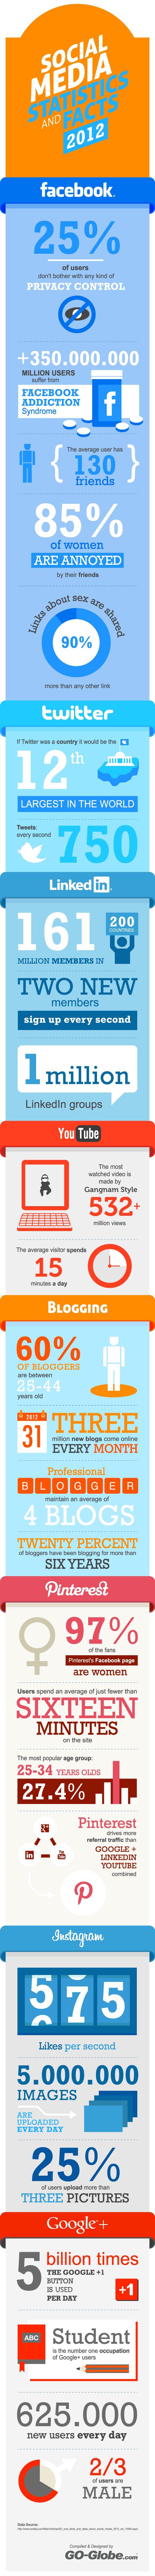 The Social Media Factsheet 2012! #infographic